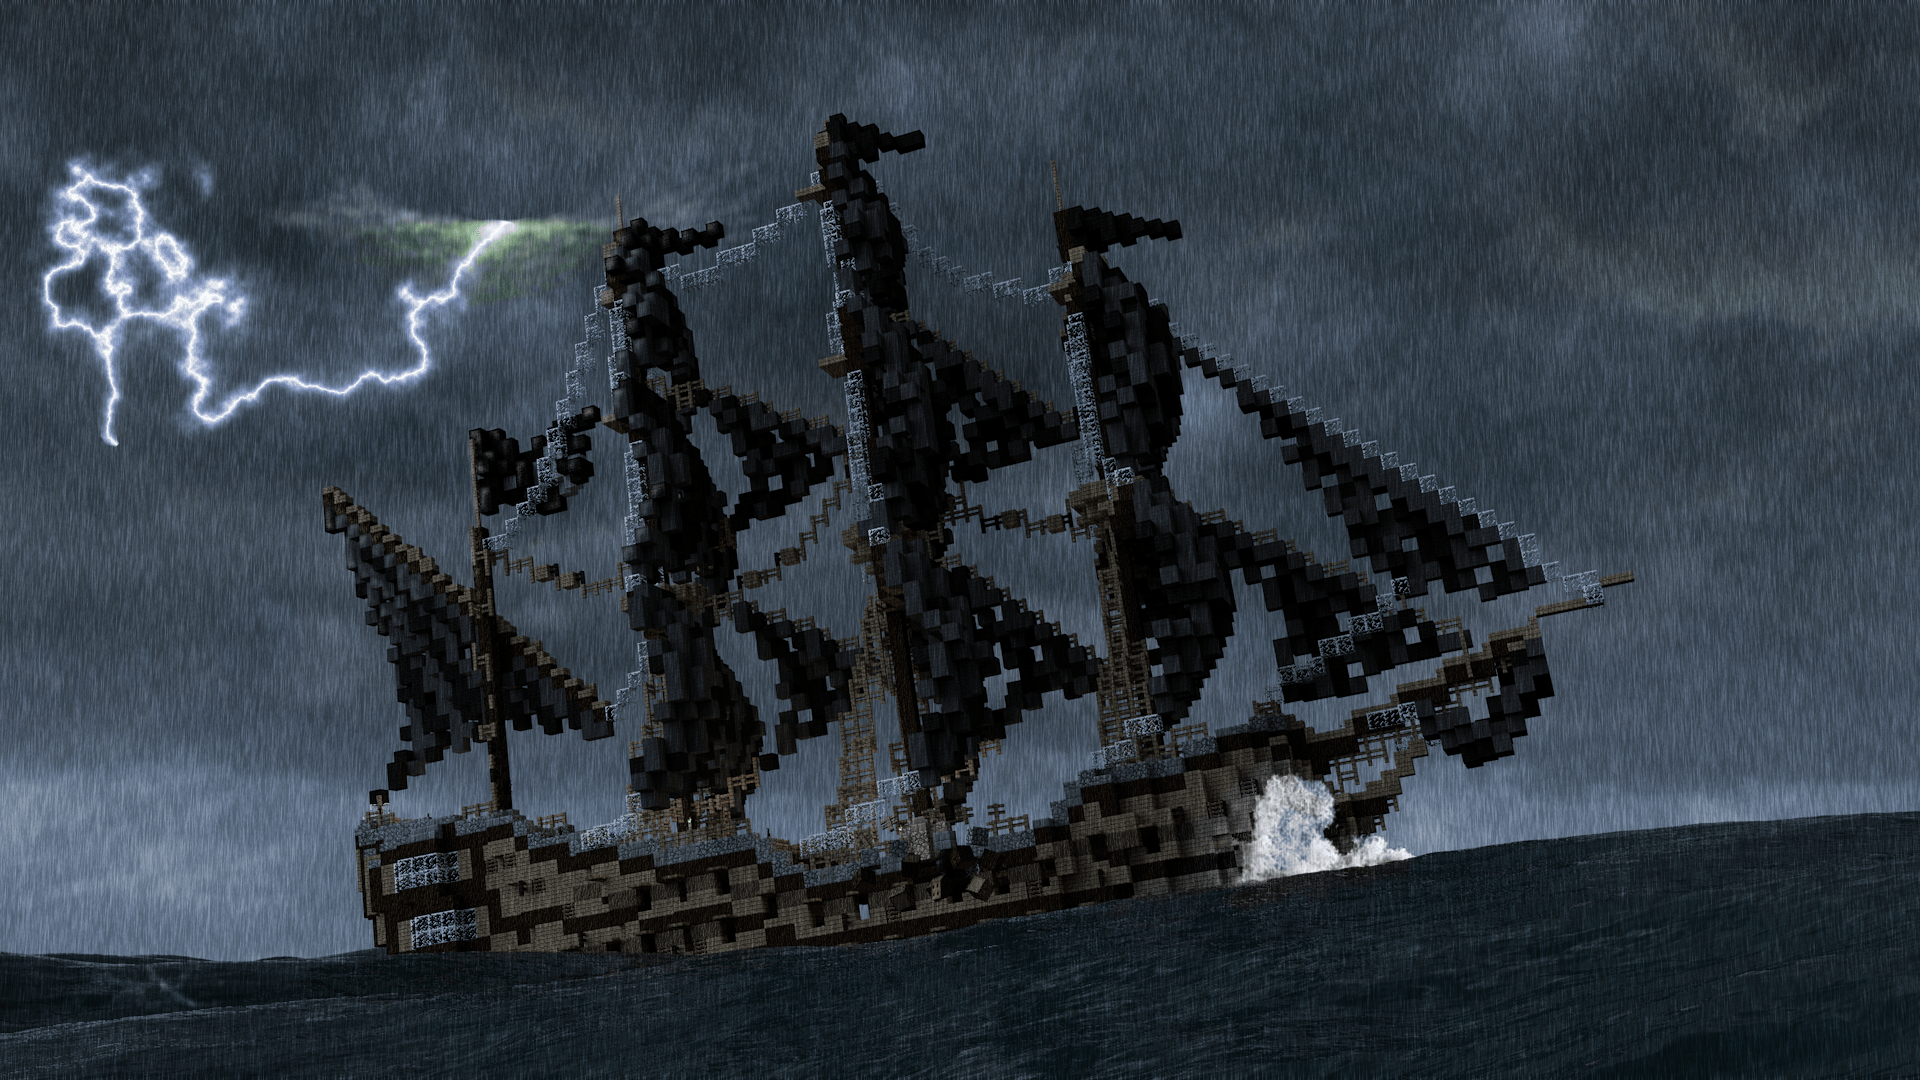 minecraft-ocean-storm-game-hd-wallpaper-1920x1080-20361